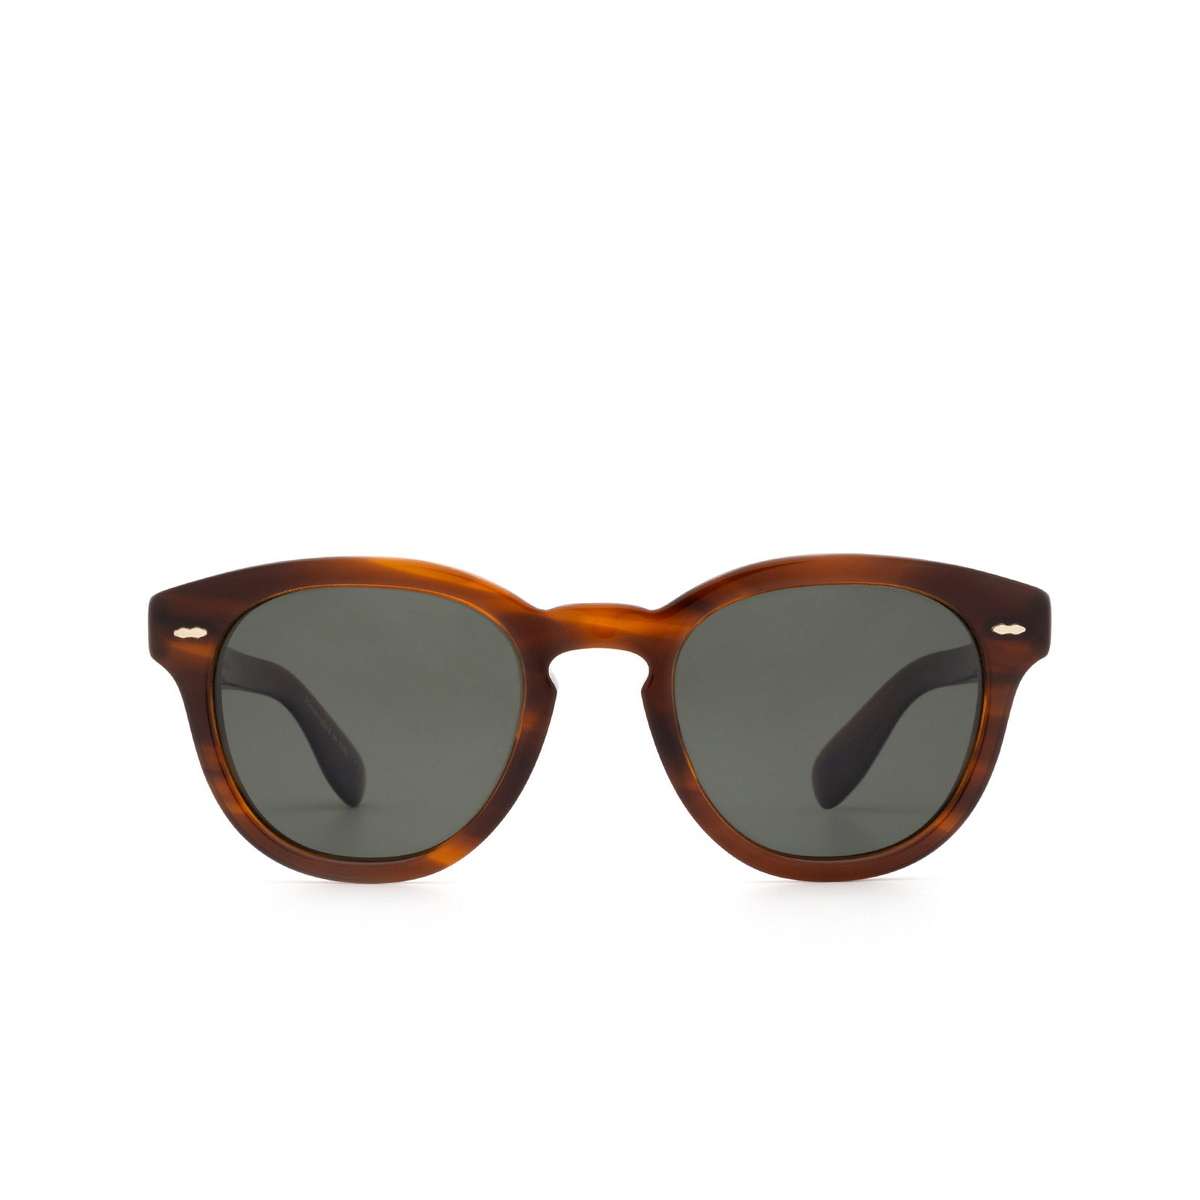 Oliver Peoples® : Cary Grant Sun OV5413SU color Grant Tortoise 1679P1.